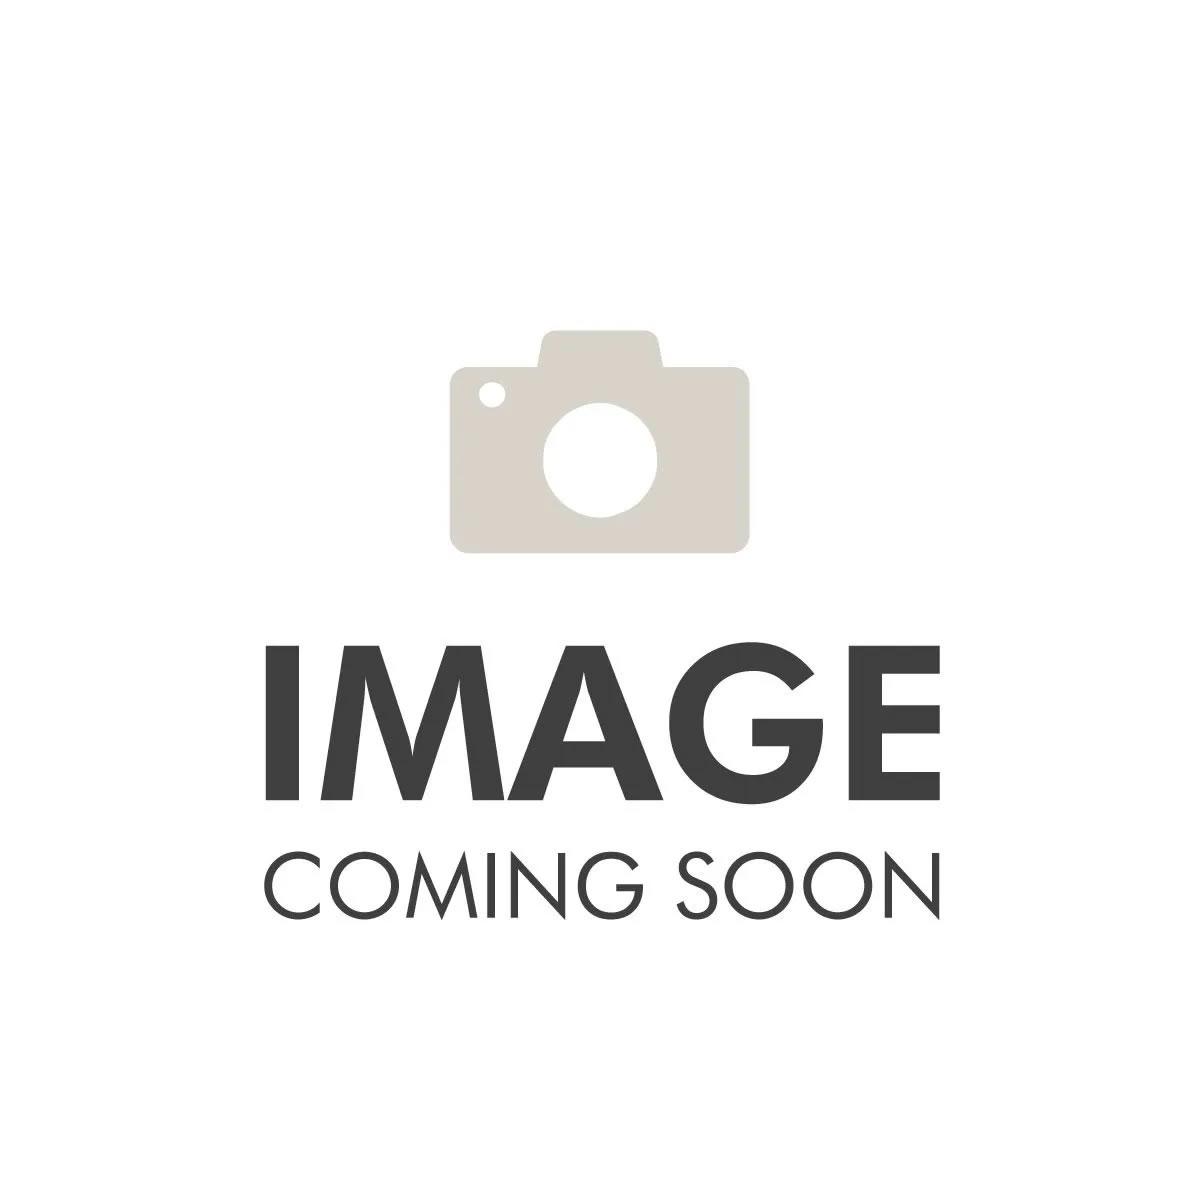 Heavy Duty Tri-Fold Recovery Shovel Multi-Use Offroad